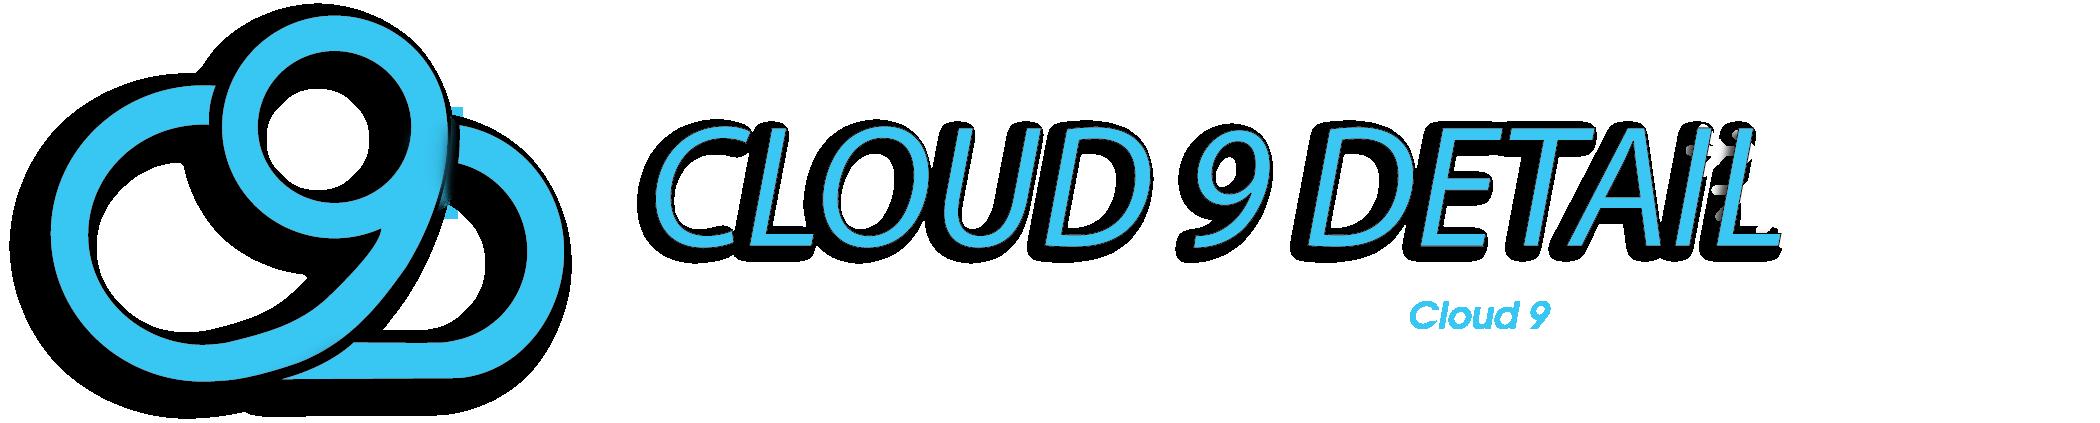 Cloud 9 Detail - Utah's Best Mobile Detail Service